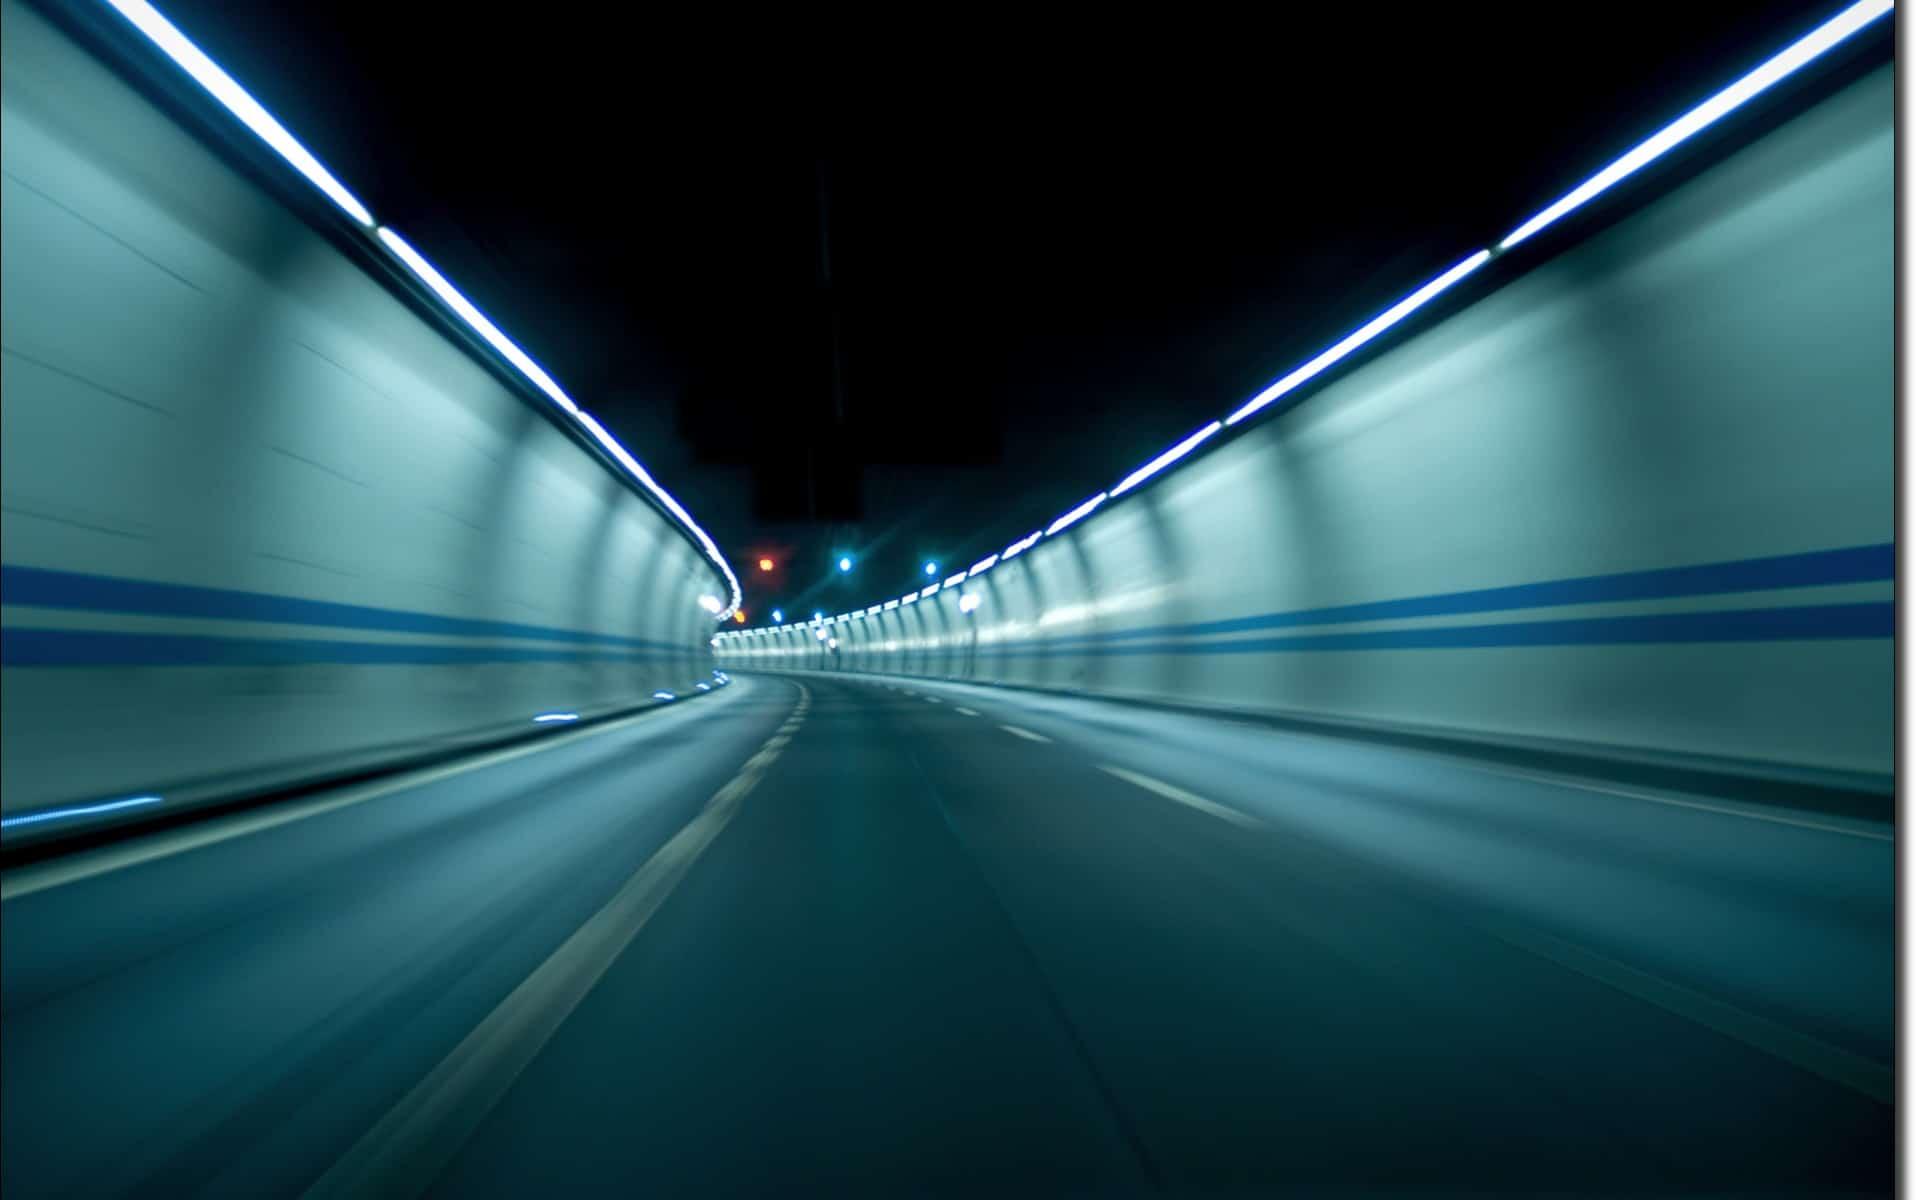 R ver d 39 un tunnel divinatix for Deep house intro